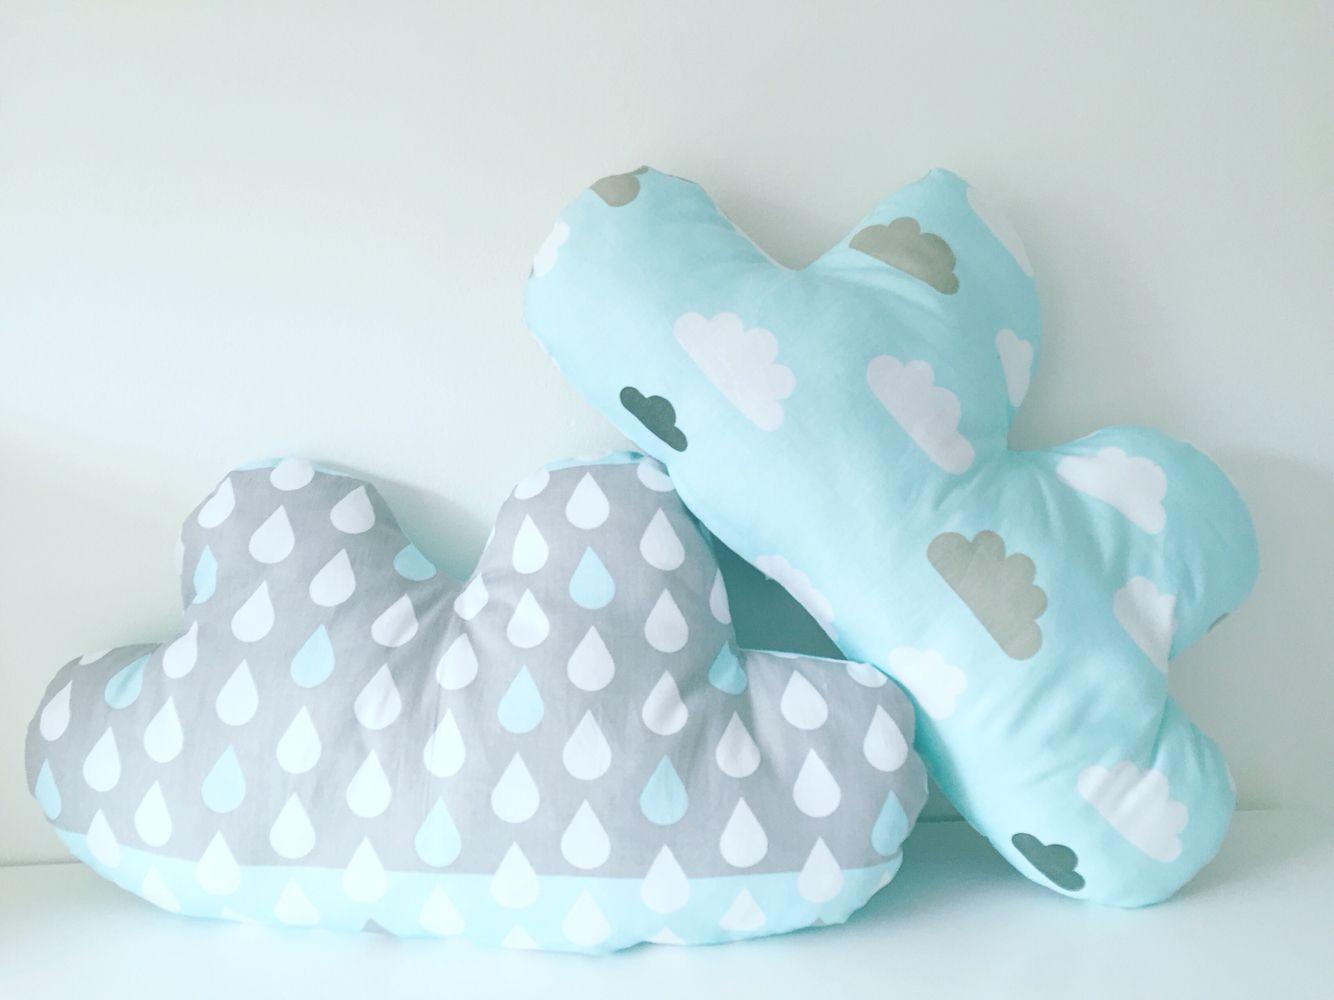 Blauwe wolkjes wokkkussens